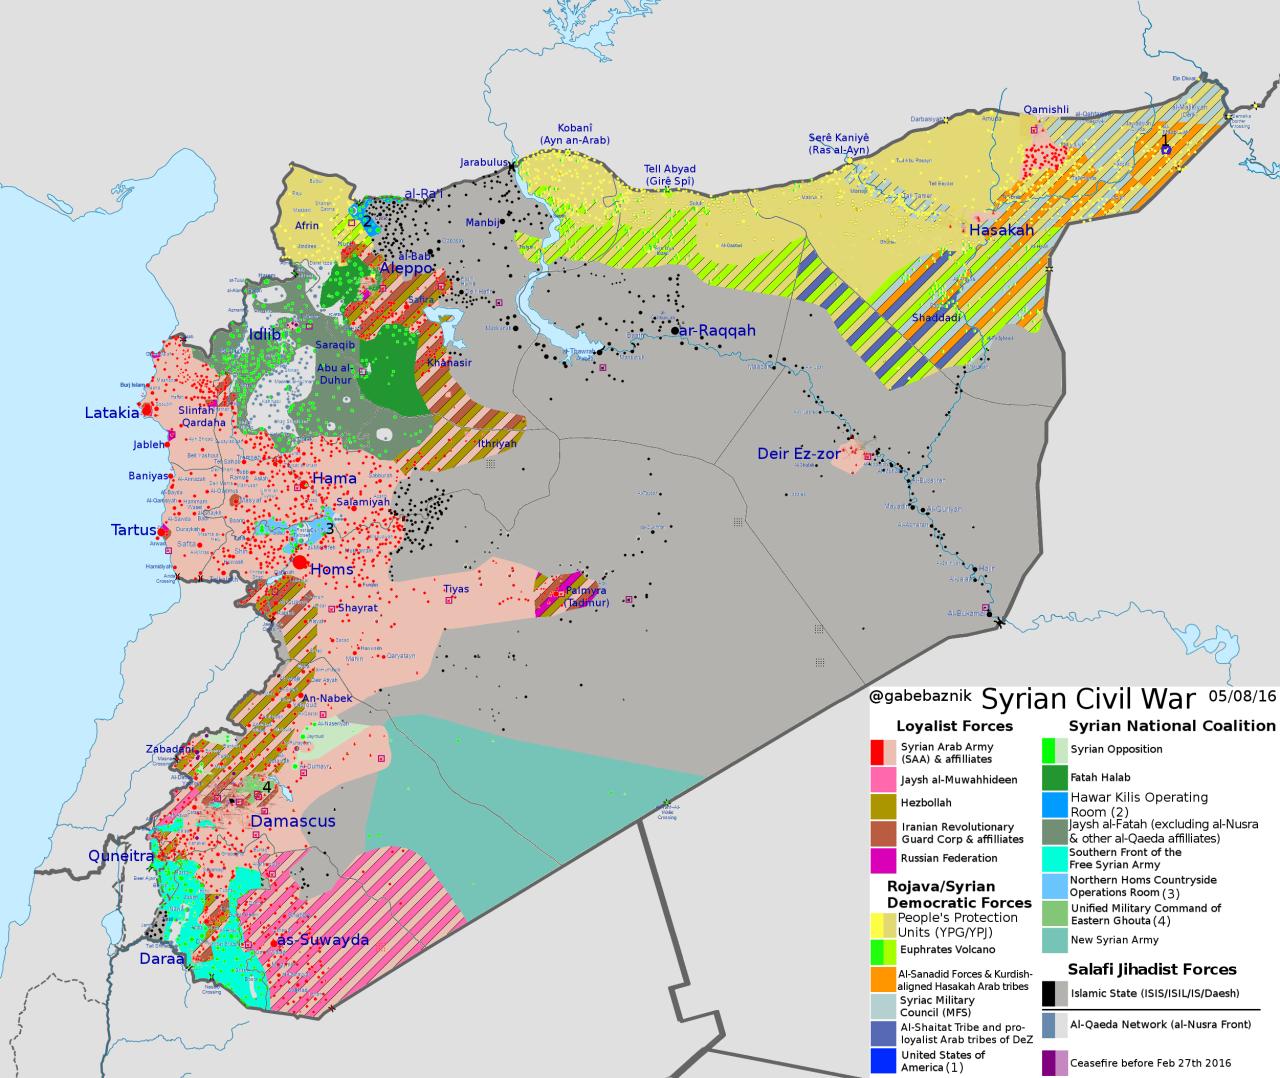 Maps 2016.Syrian Civil War May 8 2016 Maps Map Syria Syrian Civil War